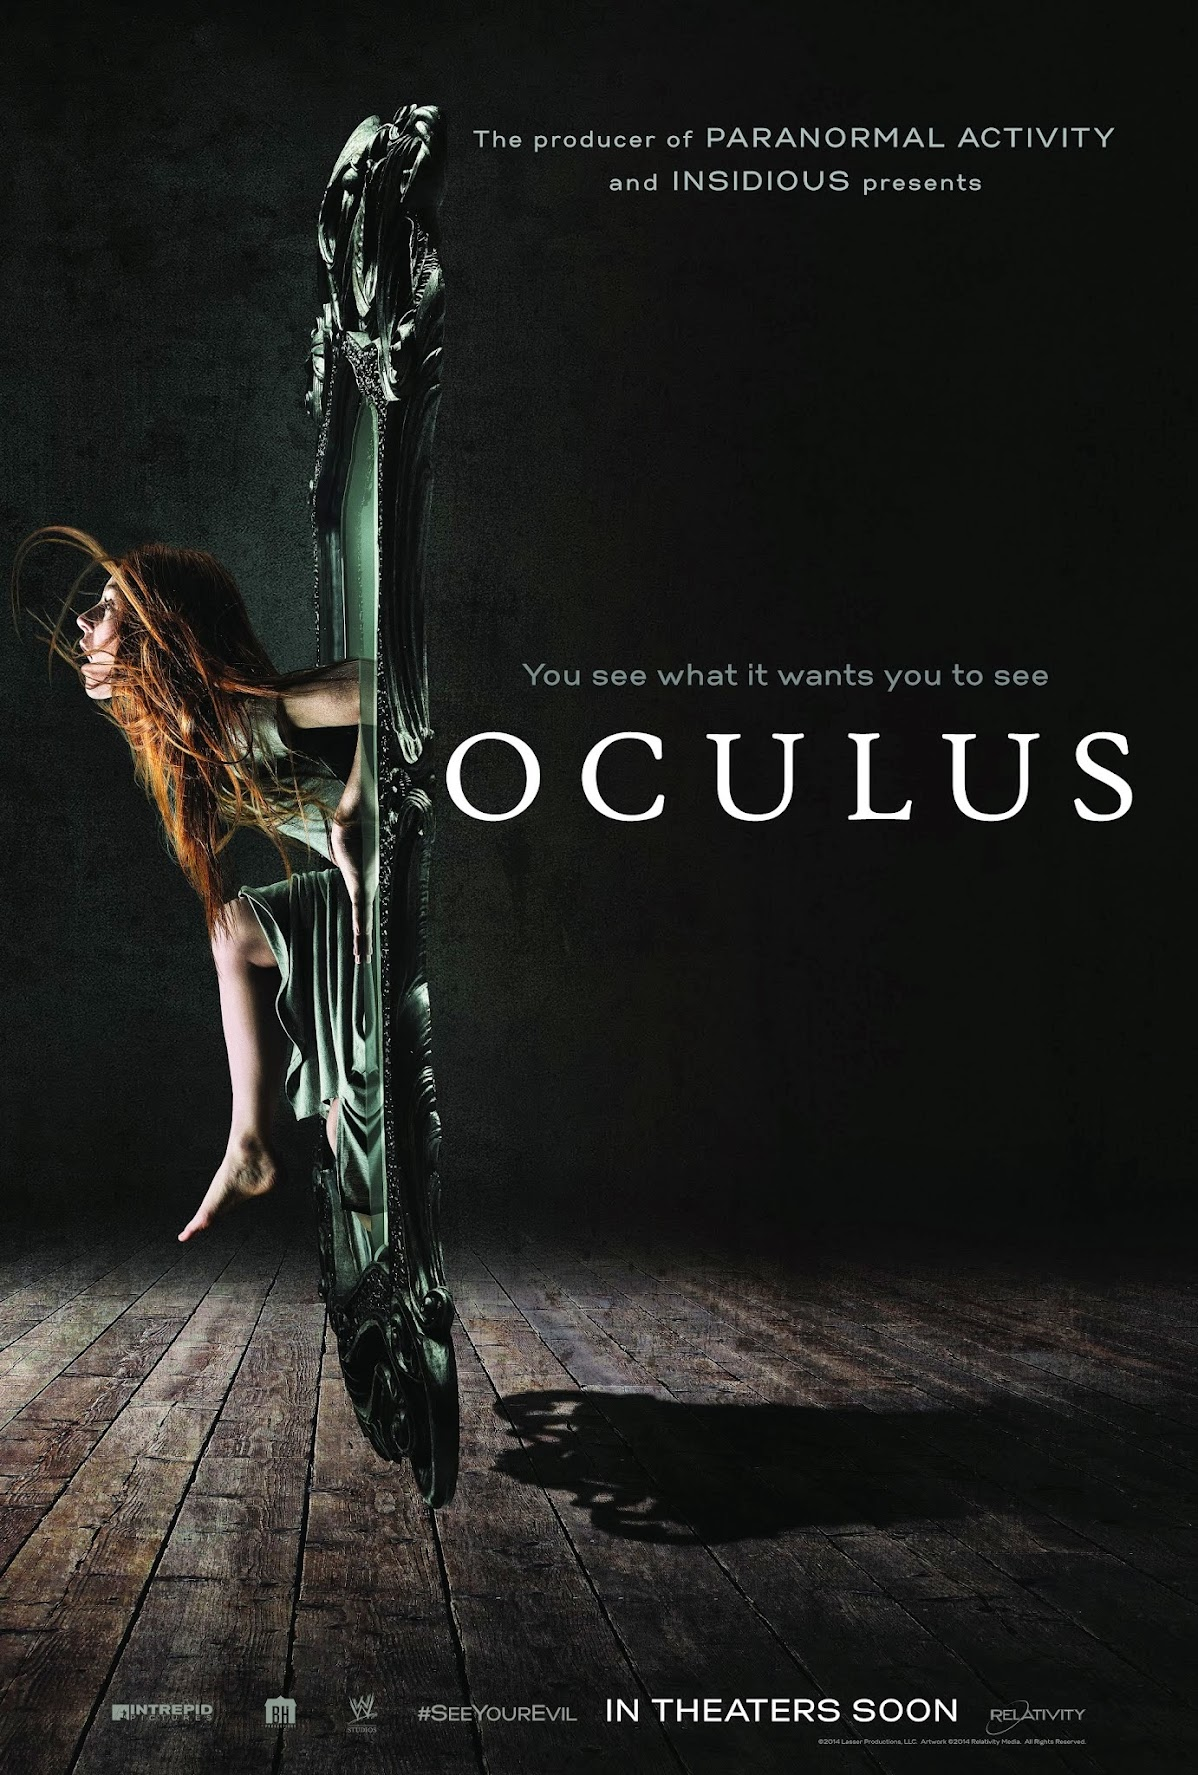 http://4.bp.blogspot.com/-oiKHEJTgCDA/Uv4vR7Tt4CI/AAAAAAAAUIQ/FI-VXQ0qELM/s1775/Oculus_New_Poster_Oficial_JPosters.jpg